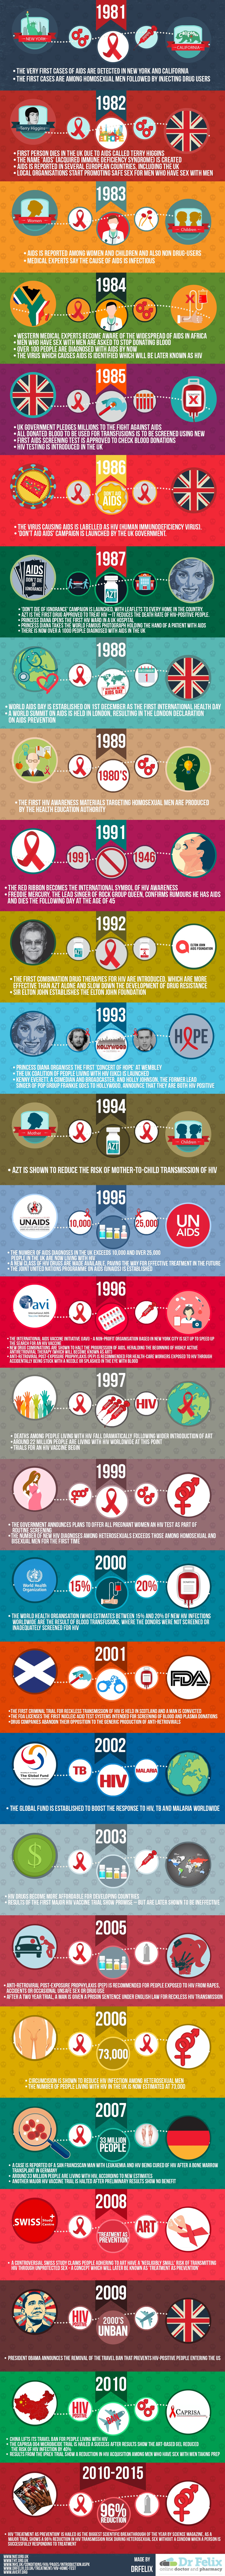 History Of HIV